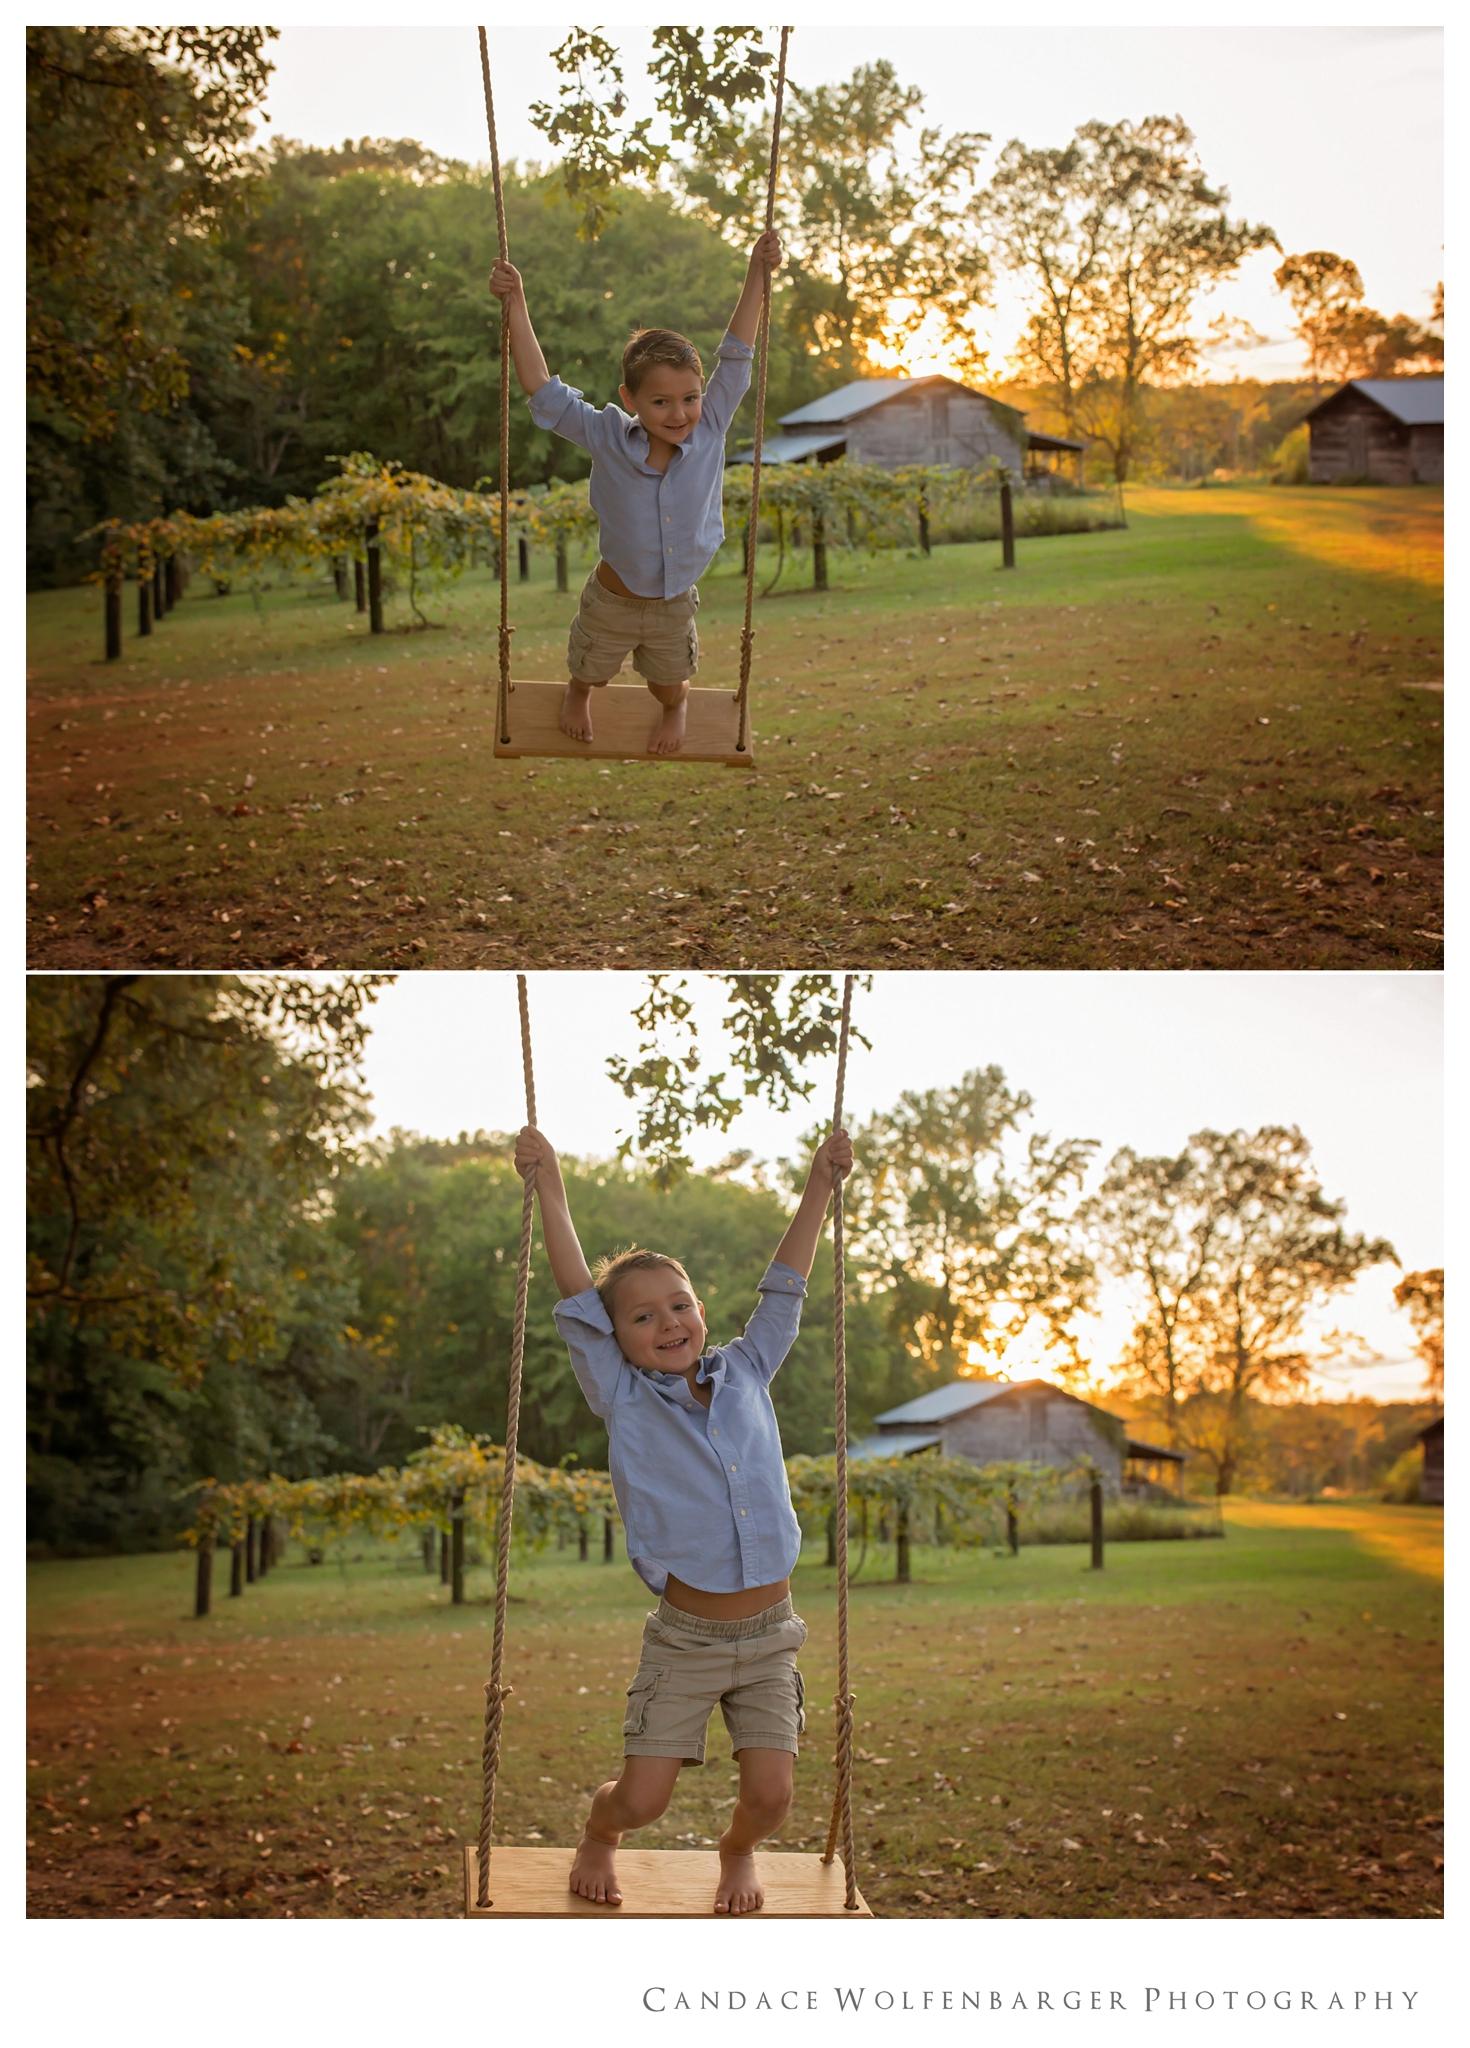 Naaman Caroline Swing Session Candace Wolfenbarger Sanford NC Childrens Photographer 7.jpg